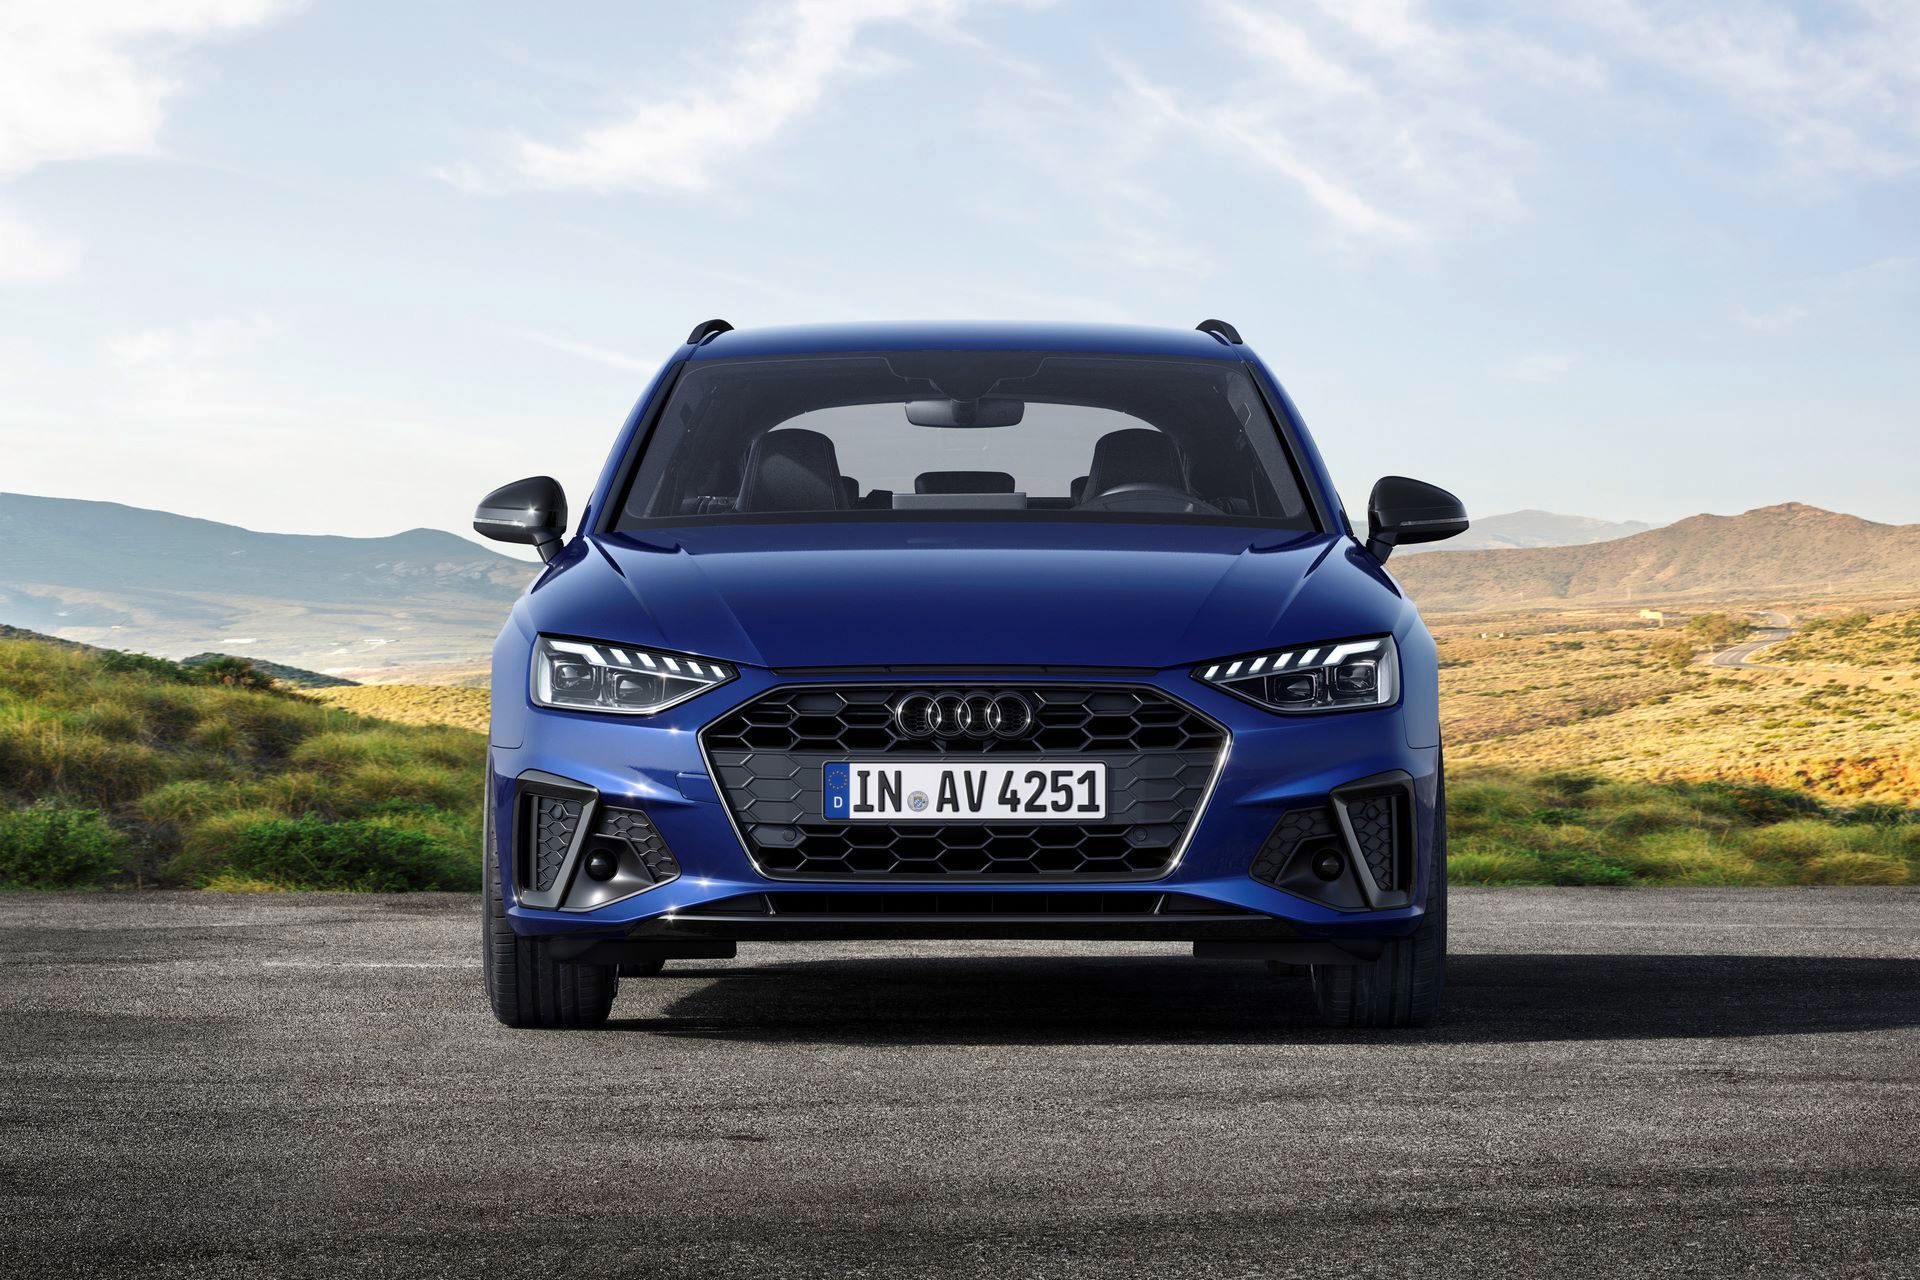 Audi-A4-A5-Q7-Q8-Competition-And-Competition-Plus-Trims-48